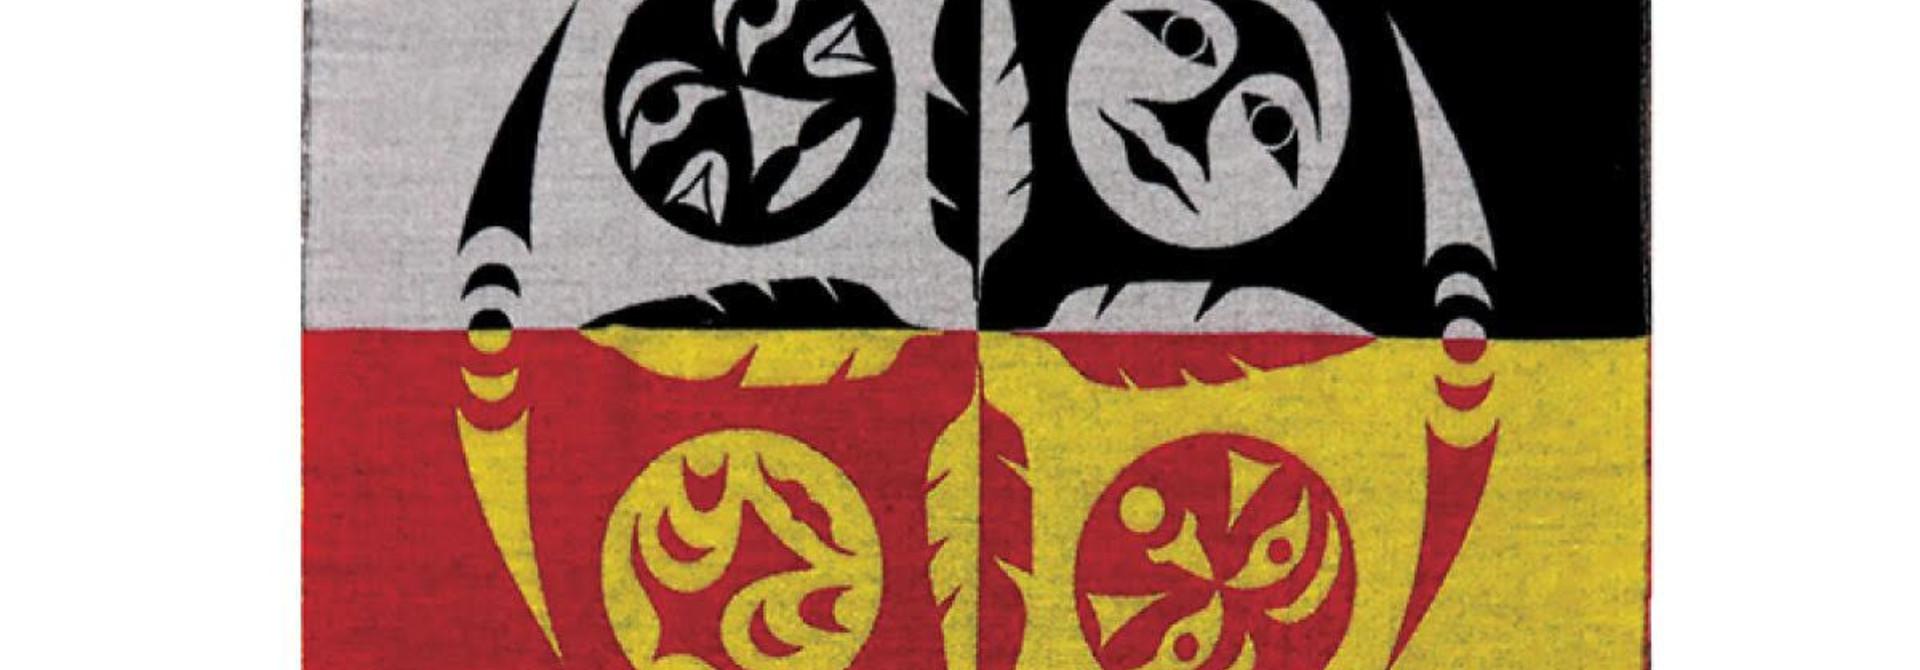 Woven Blanket-Diversity by Melany Gleeson-Lyall